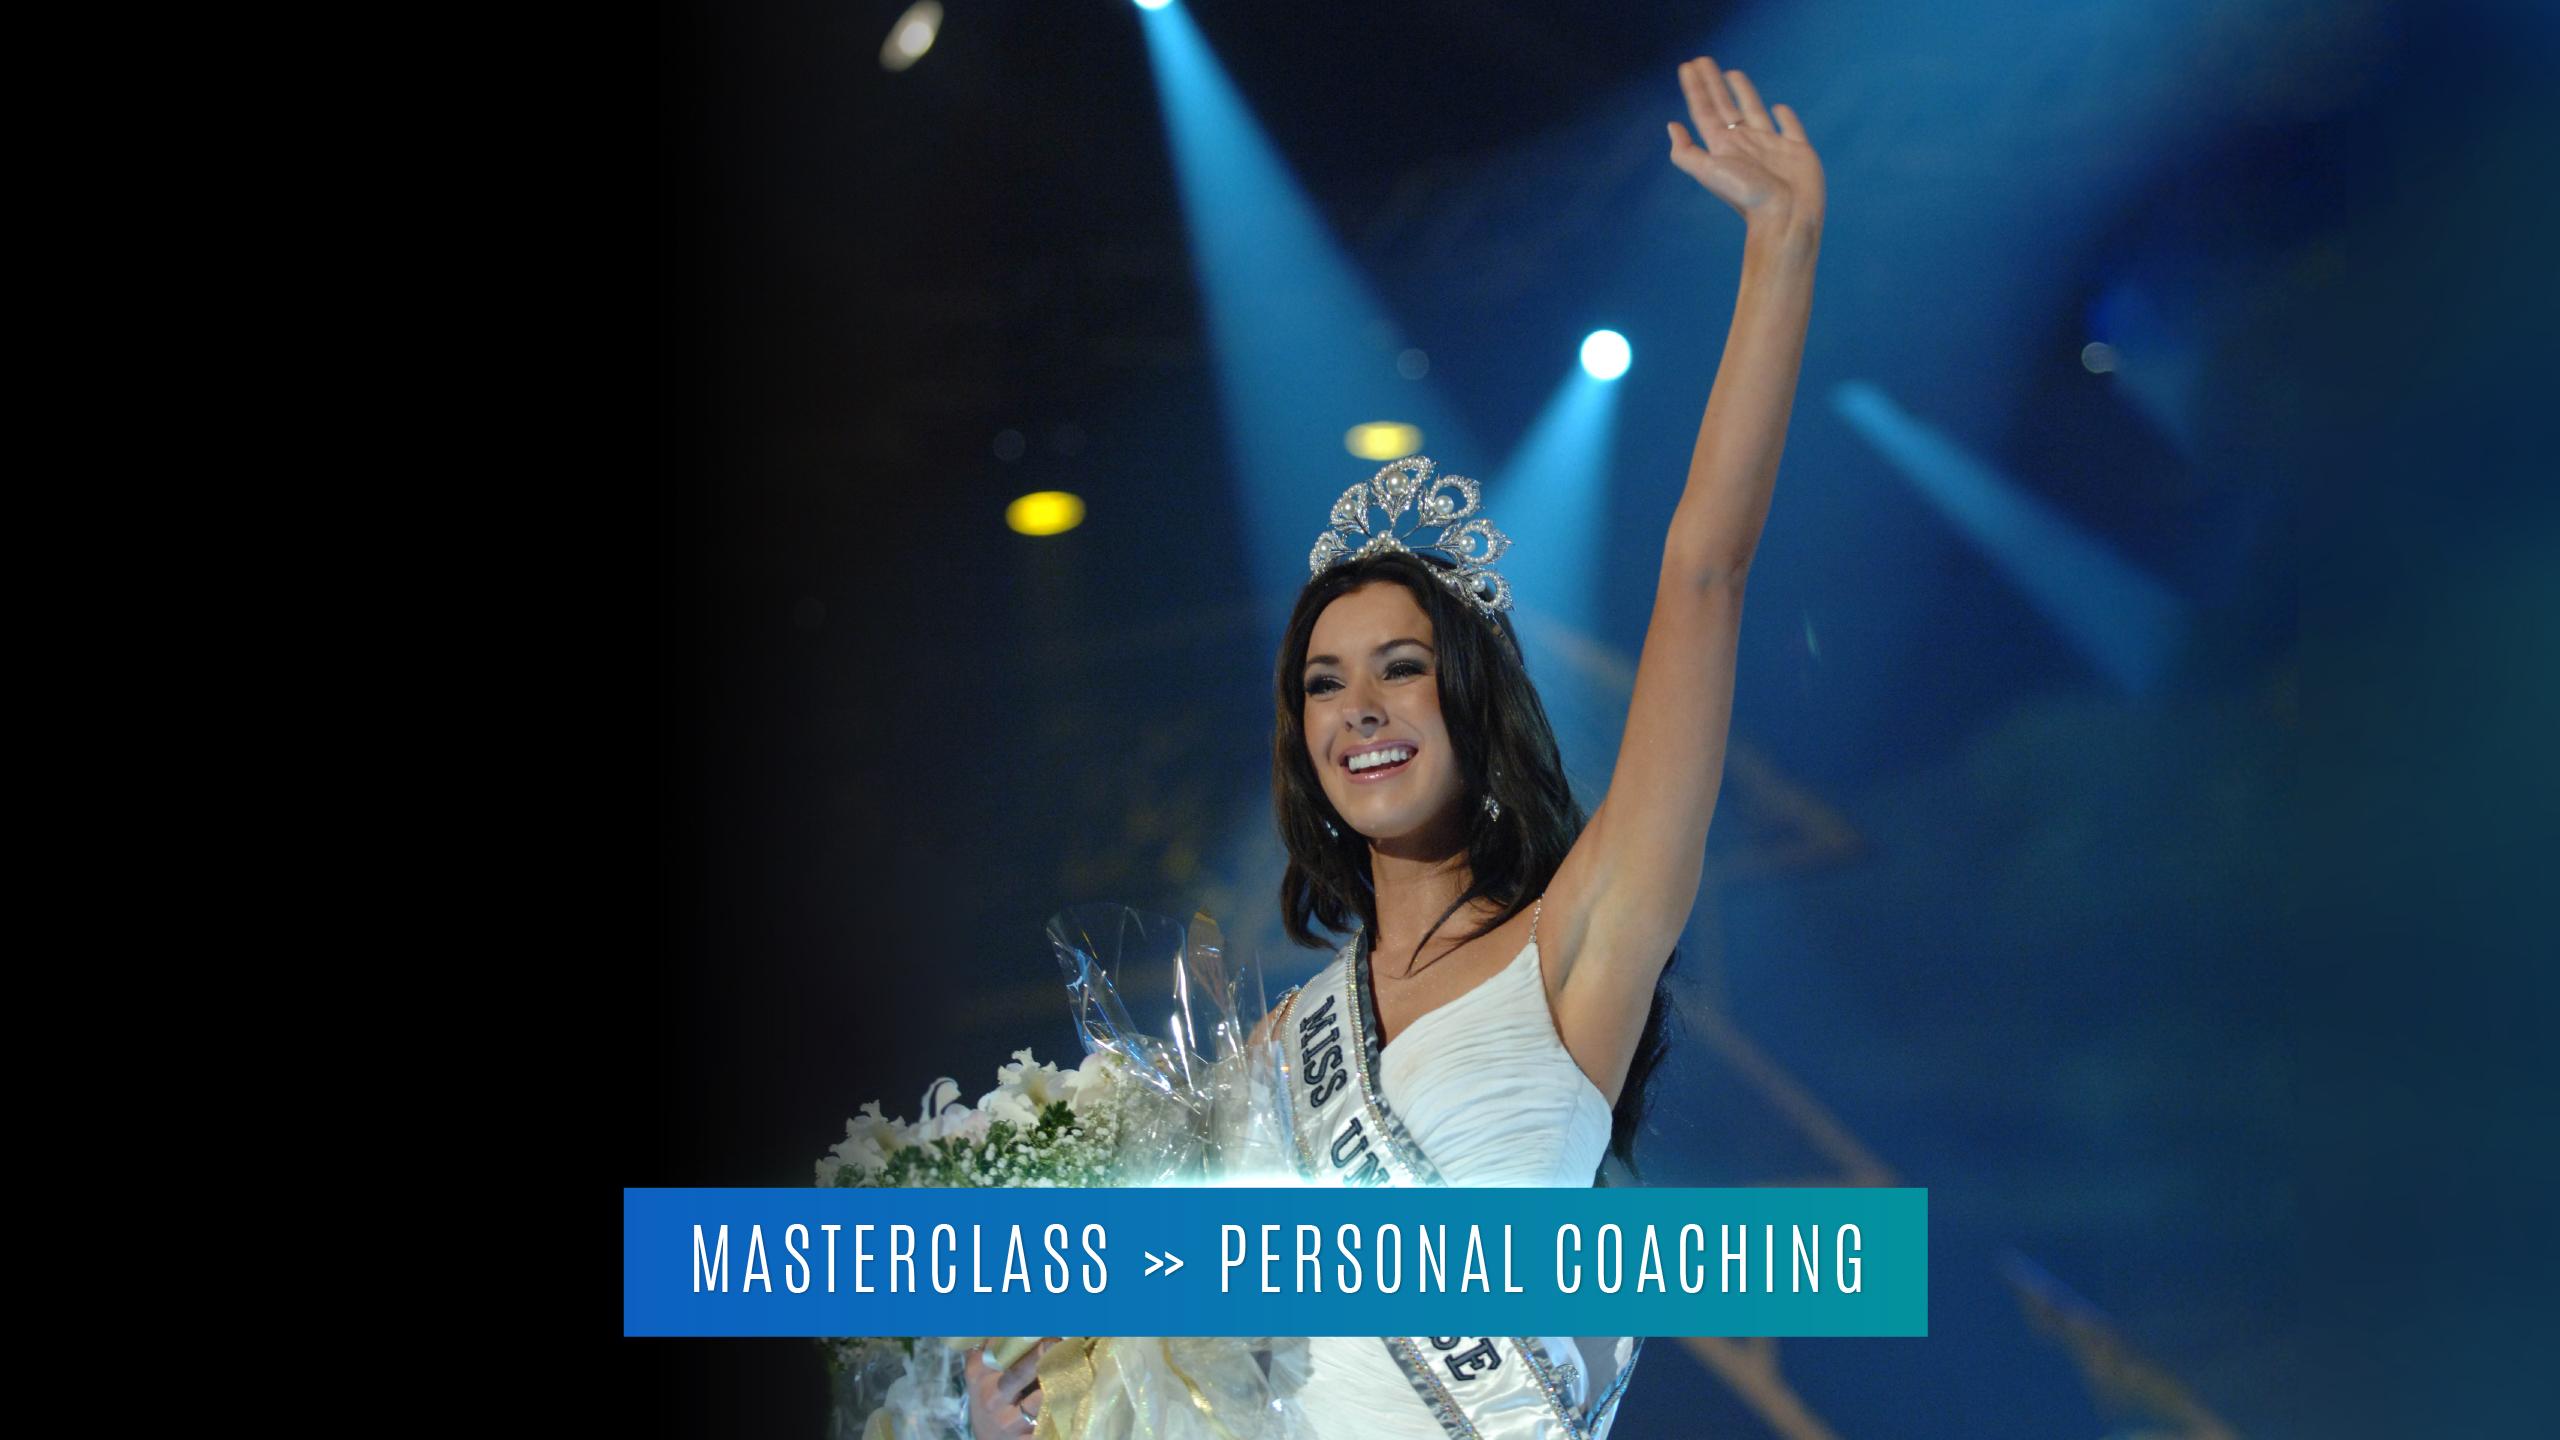 1-ON-1 COACHING W/ NATALIE GLEBOVA | WIN THE CROWN — MASTERCLASS